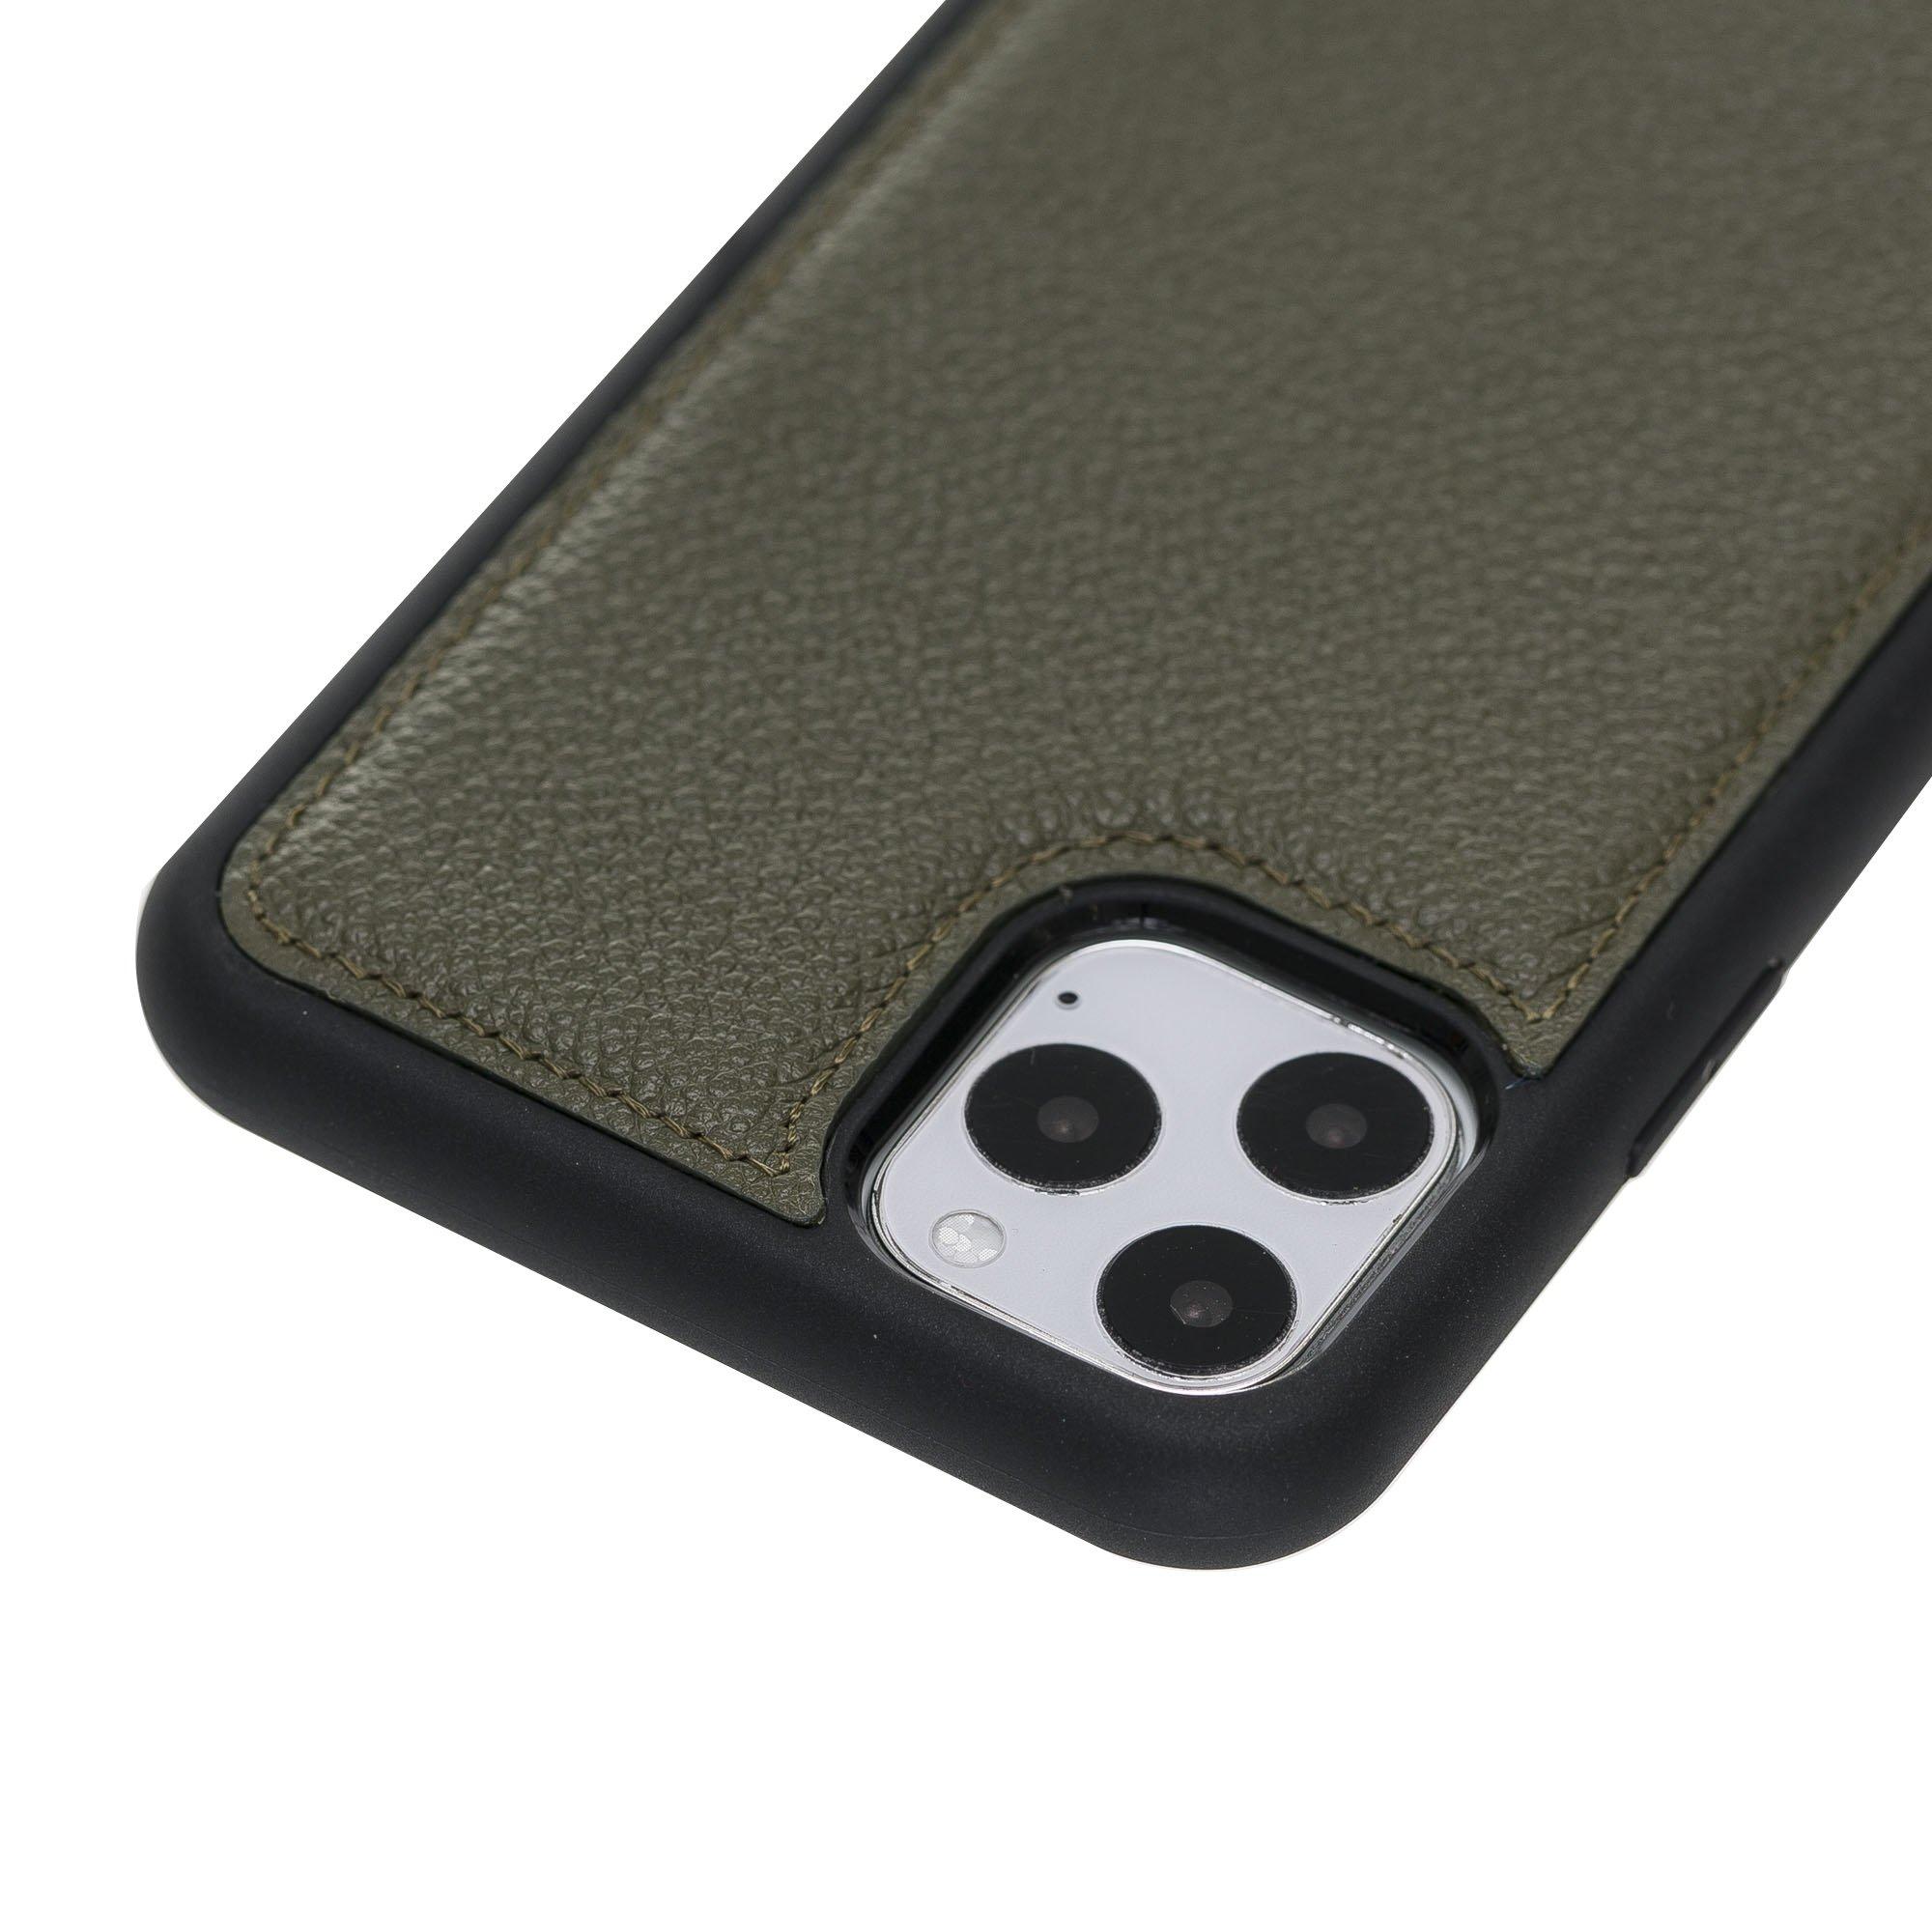 Solo Pelle Lederhülle für das iPhone 11 Pro (Max) 6.5 Zoll Stanford (Nachtgrün)